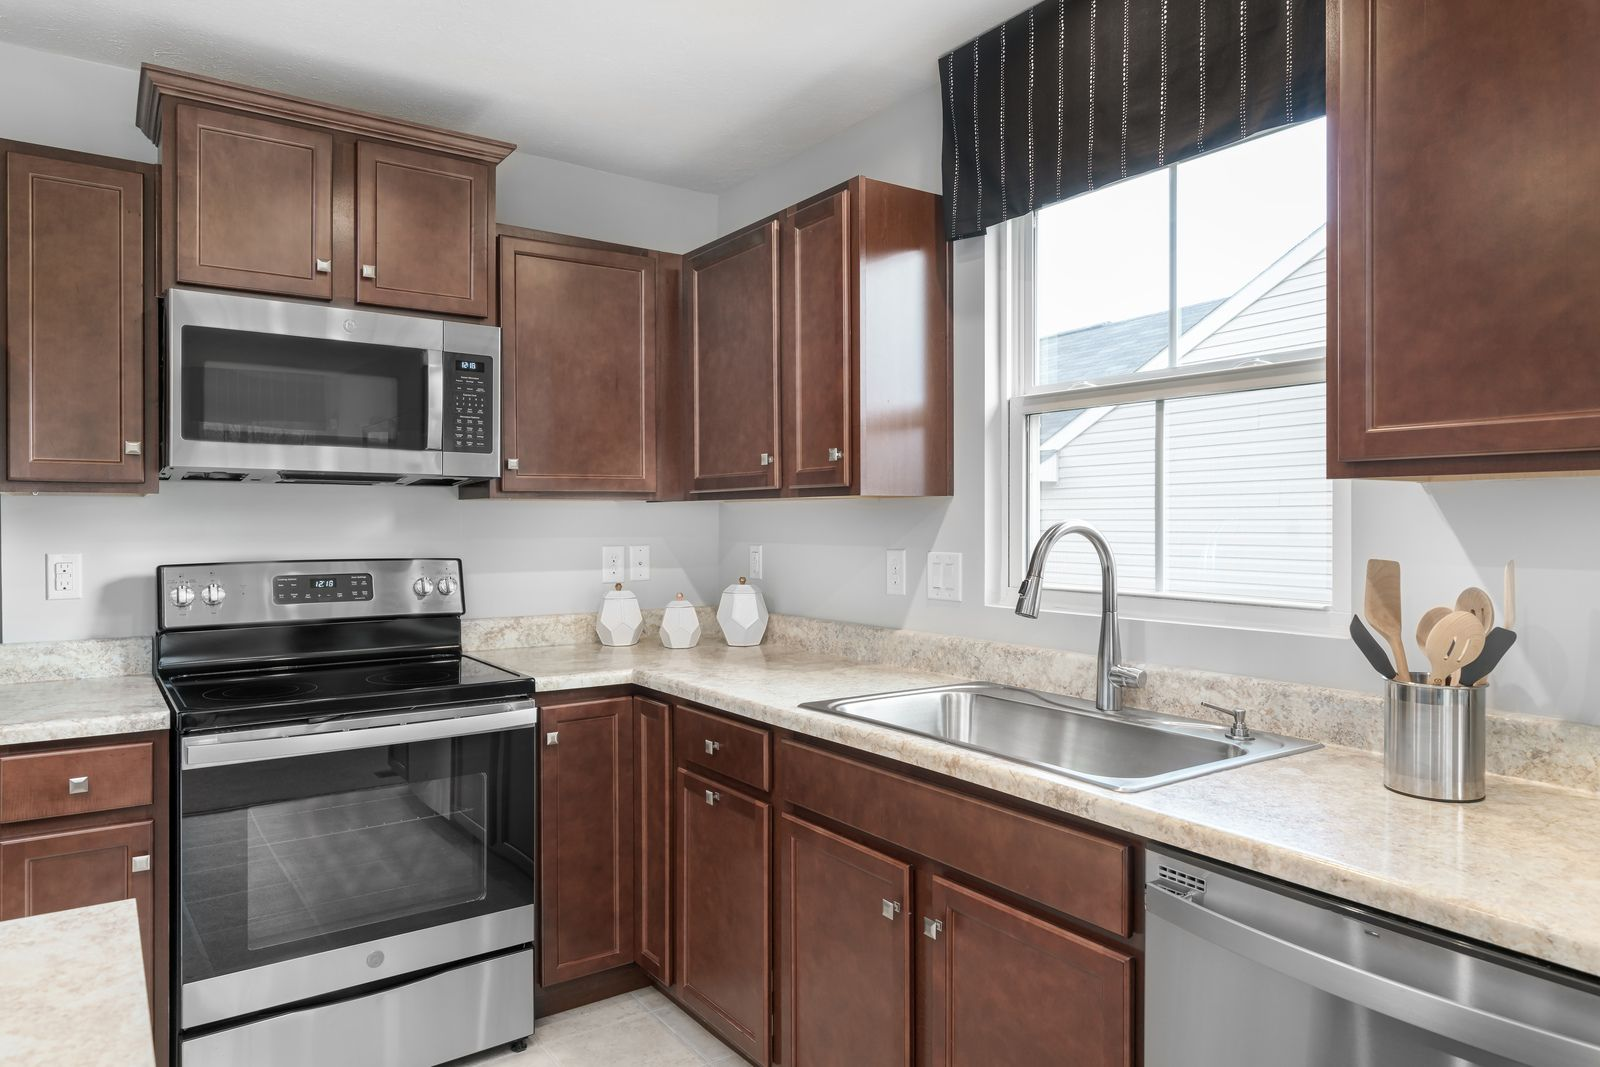 Kitchen featured in the Aruba Bay By Ryan Homes in Norfolk-Newport News, VA